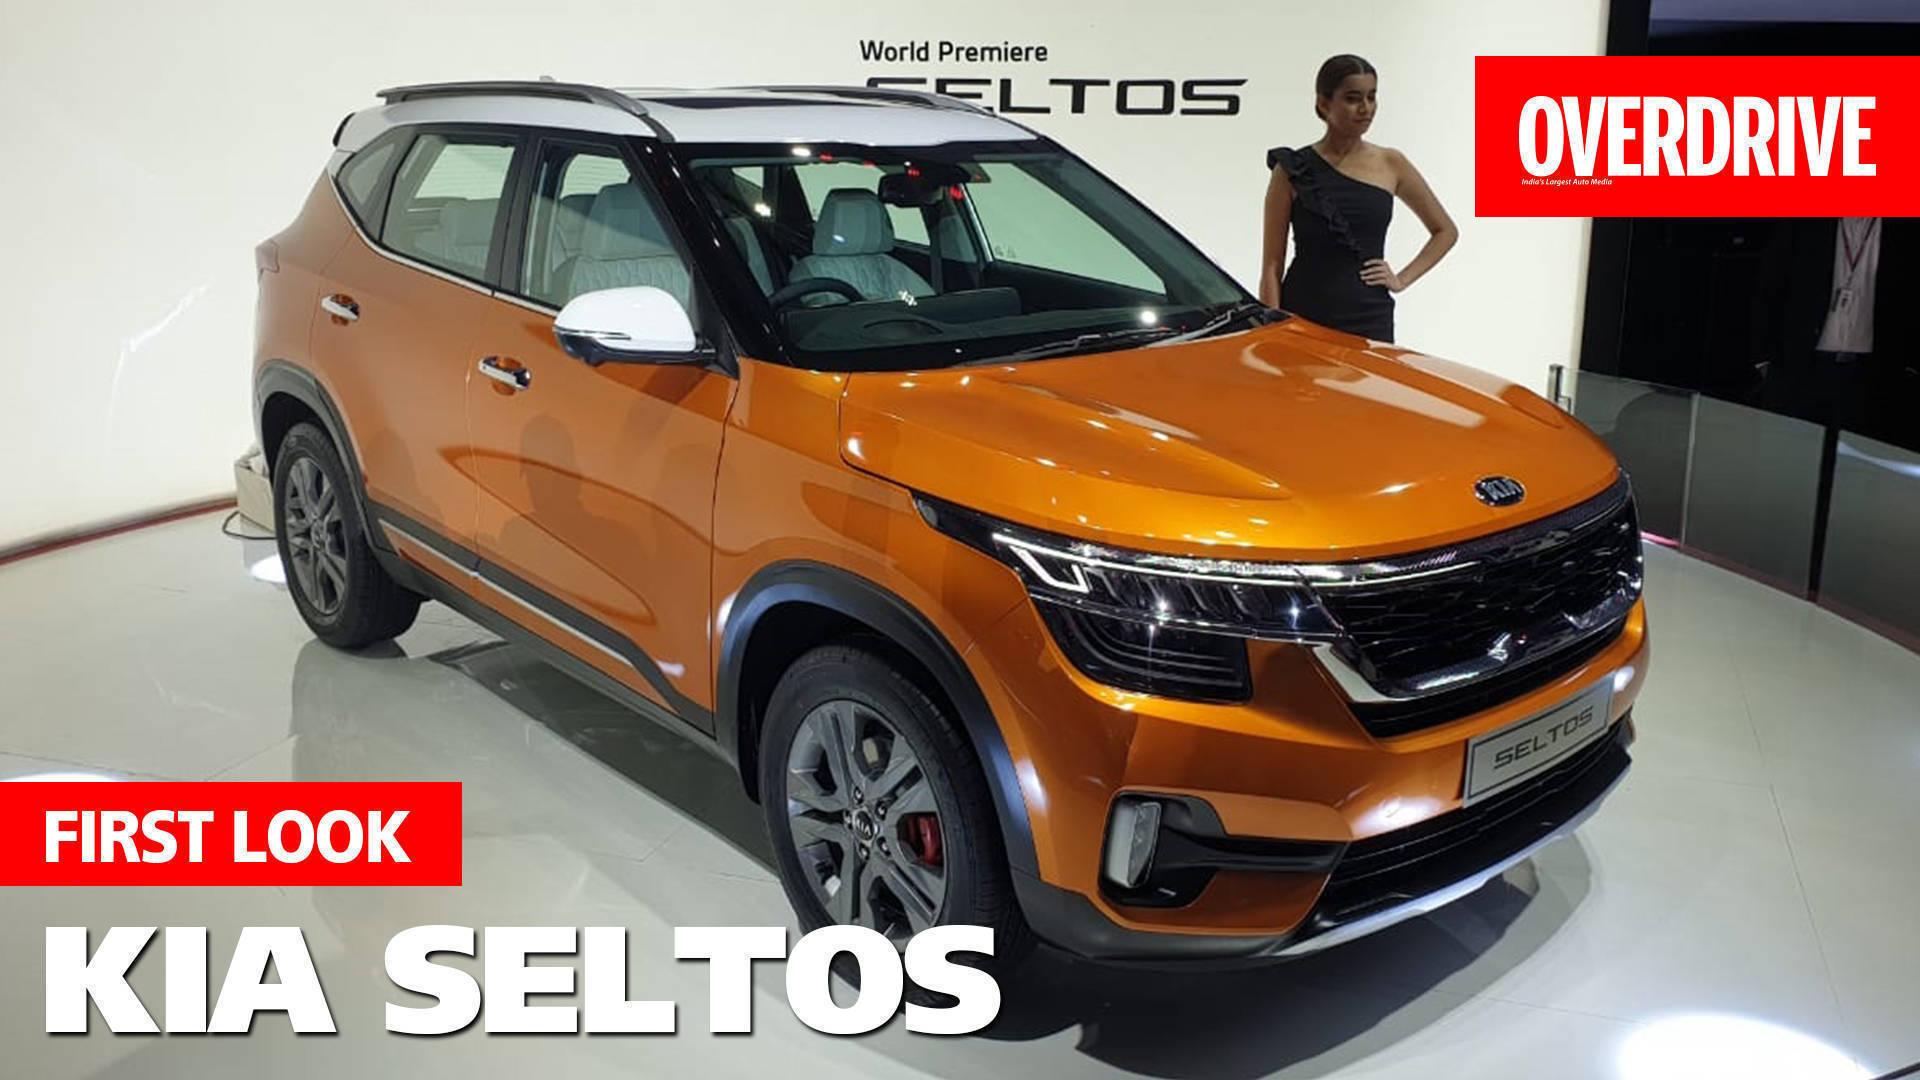 Kia Seltos | First Look